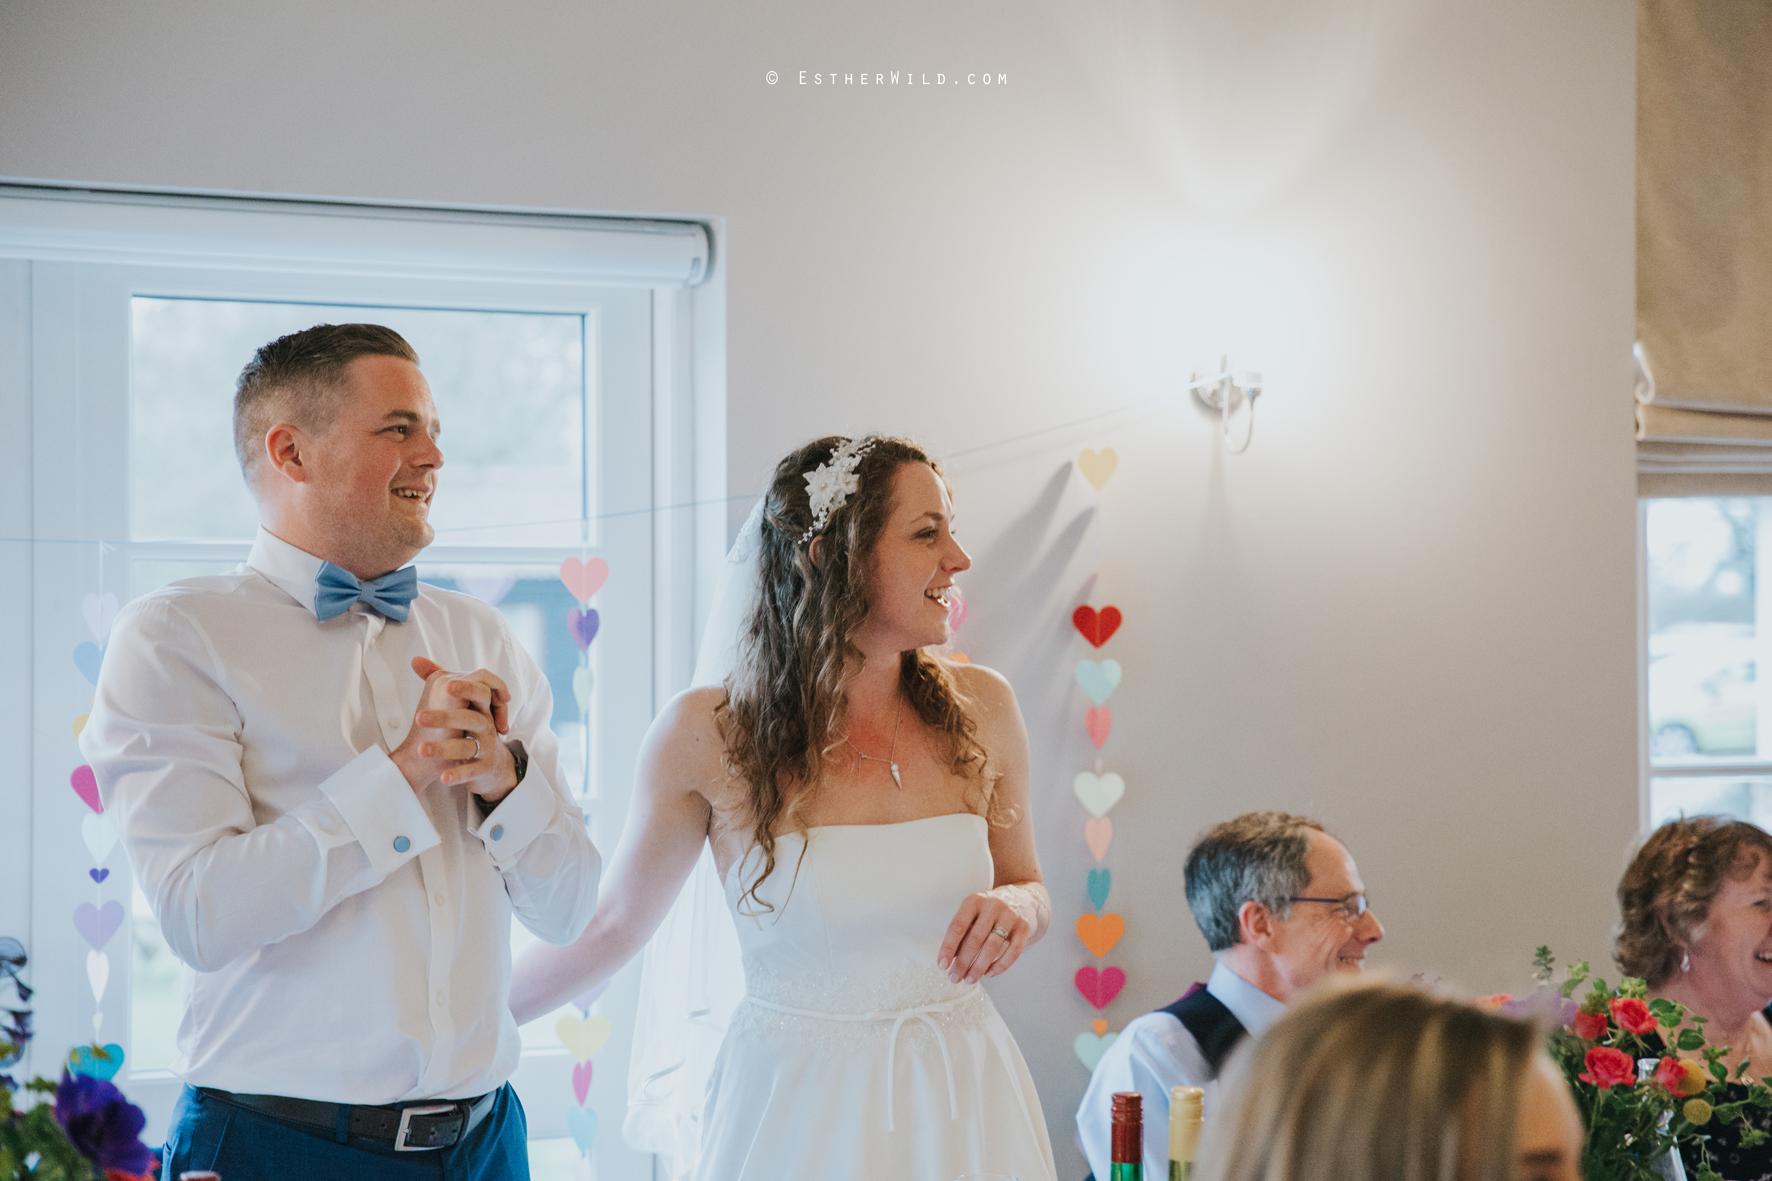 The_BoatHouse_Wedding_Venue_Ormesby_Norfolk_Broads_Boat_Wedding_Photography_Esther_Wild_Photographer_IMG_2490.jpg